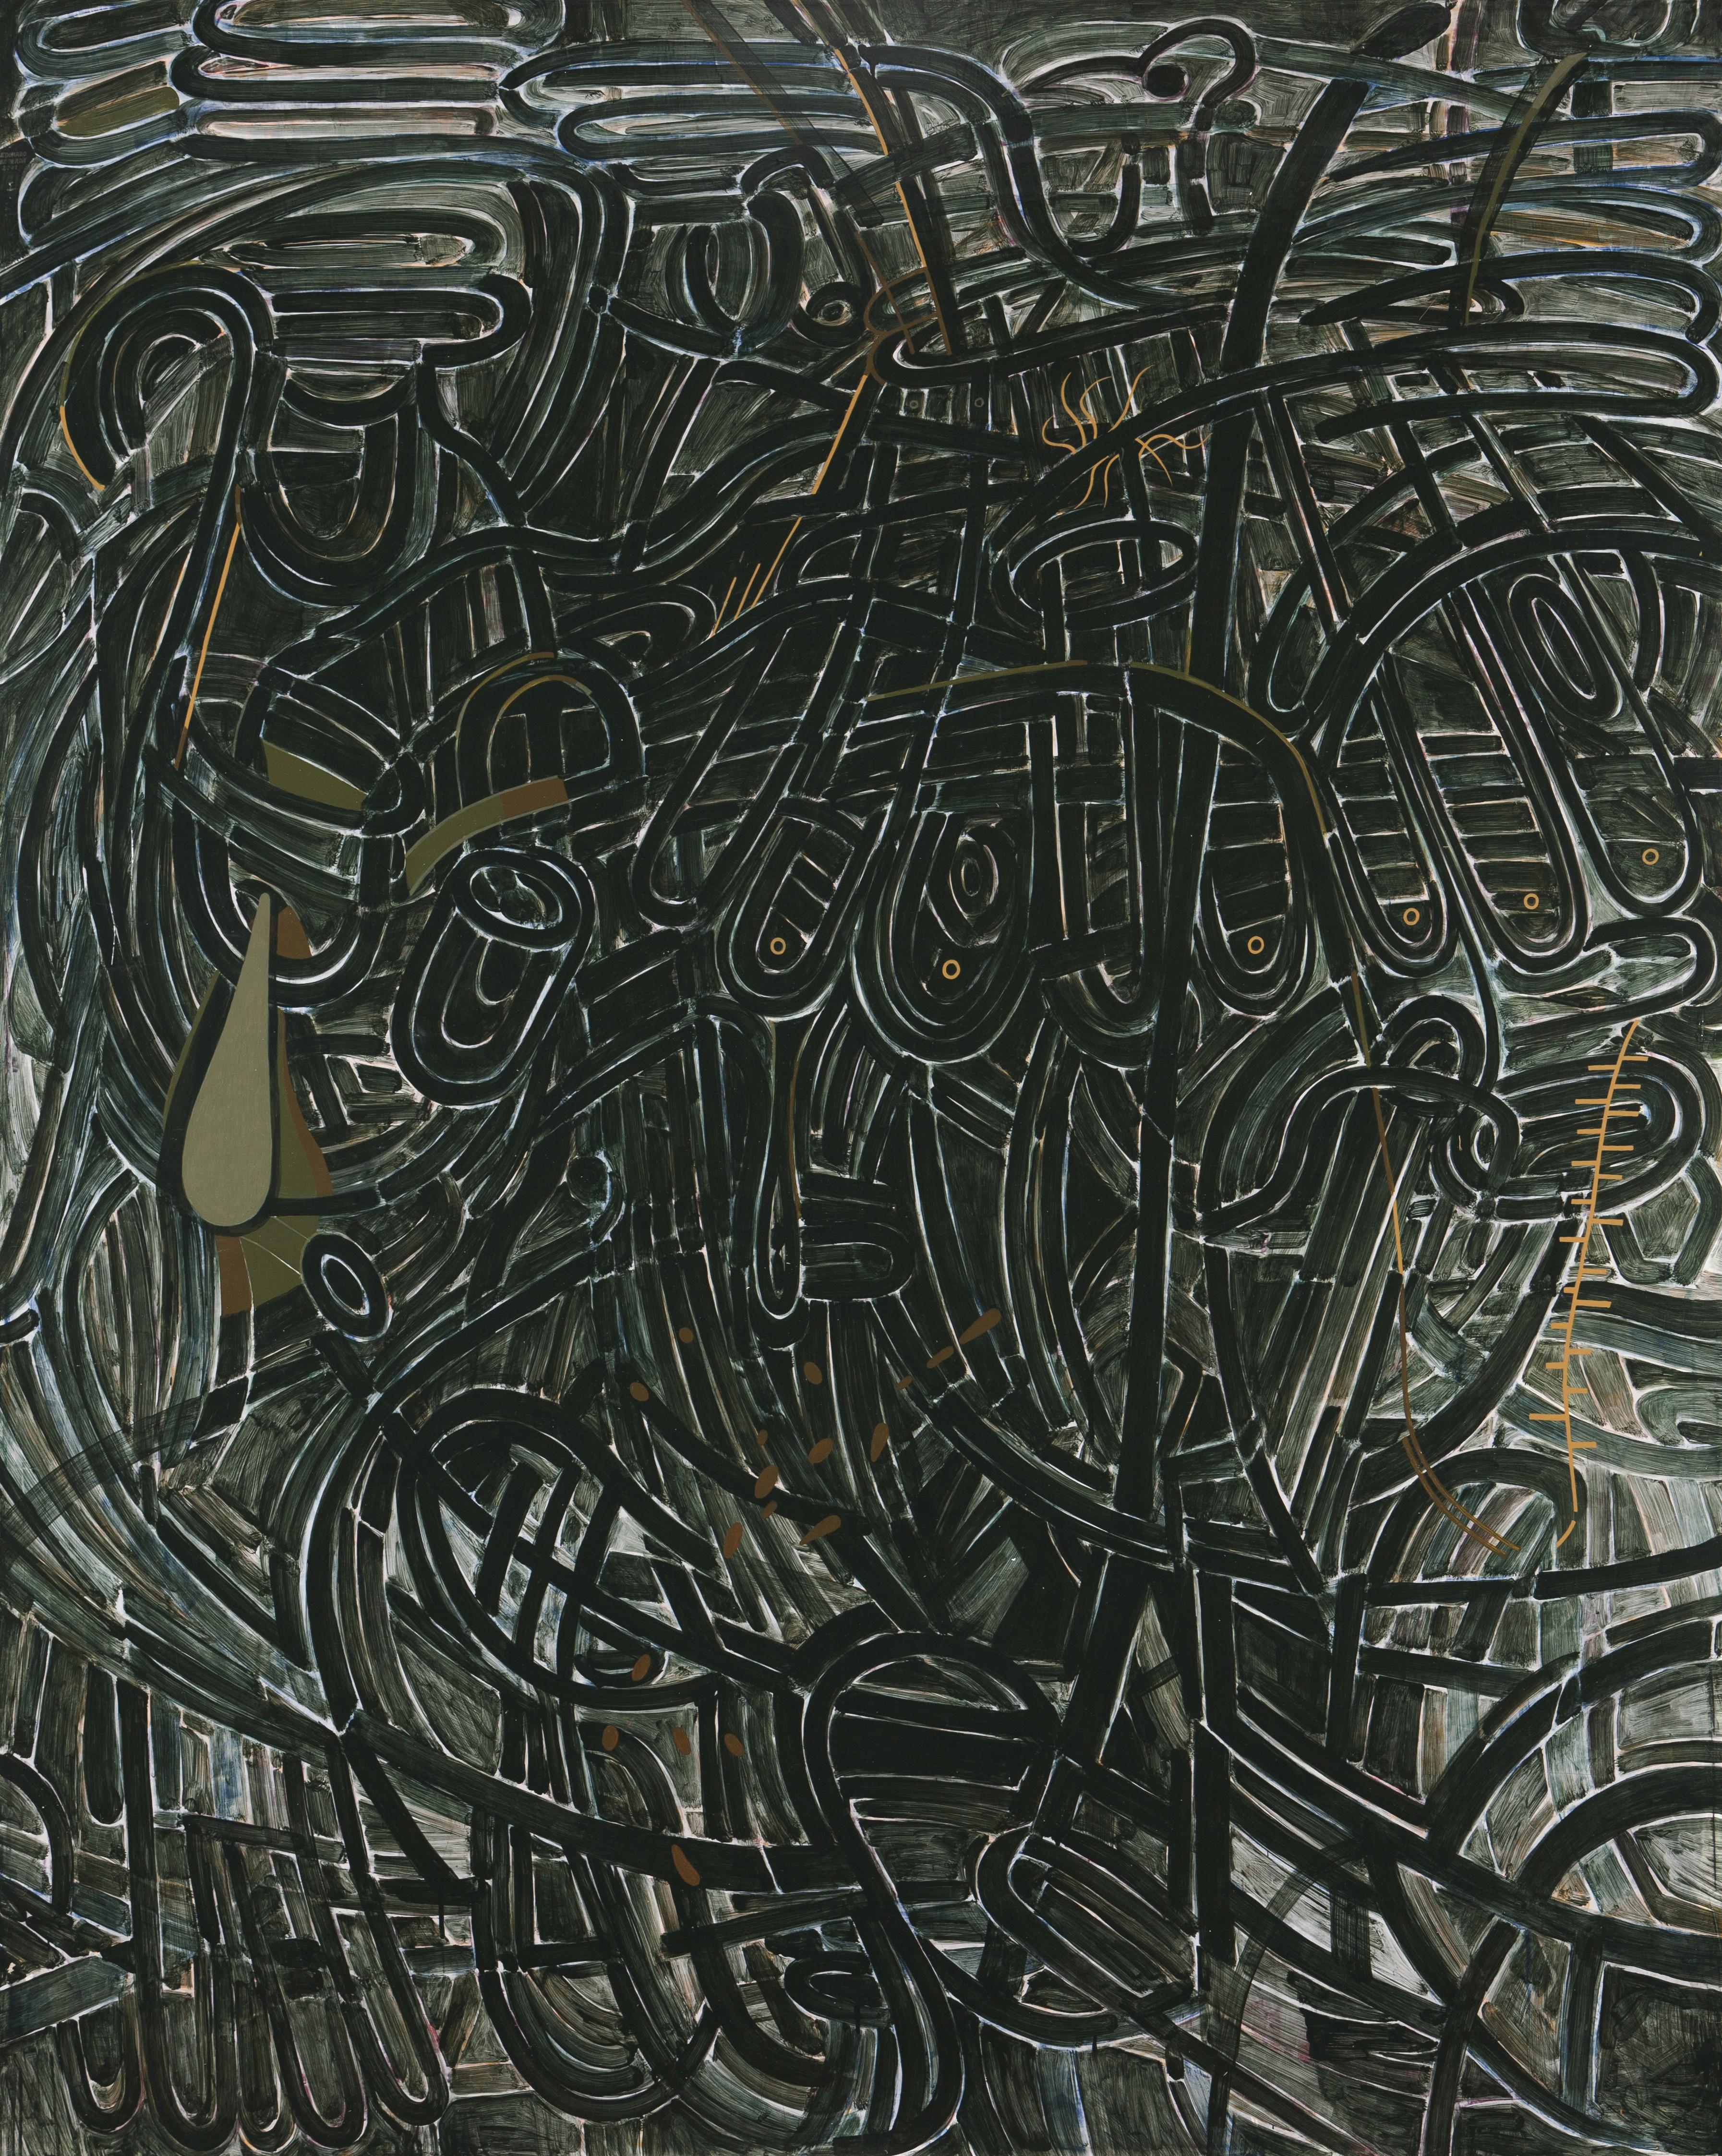 """Suburra 18"", 2001 - Eduardo Batarda (n. 1943)"